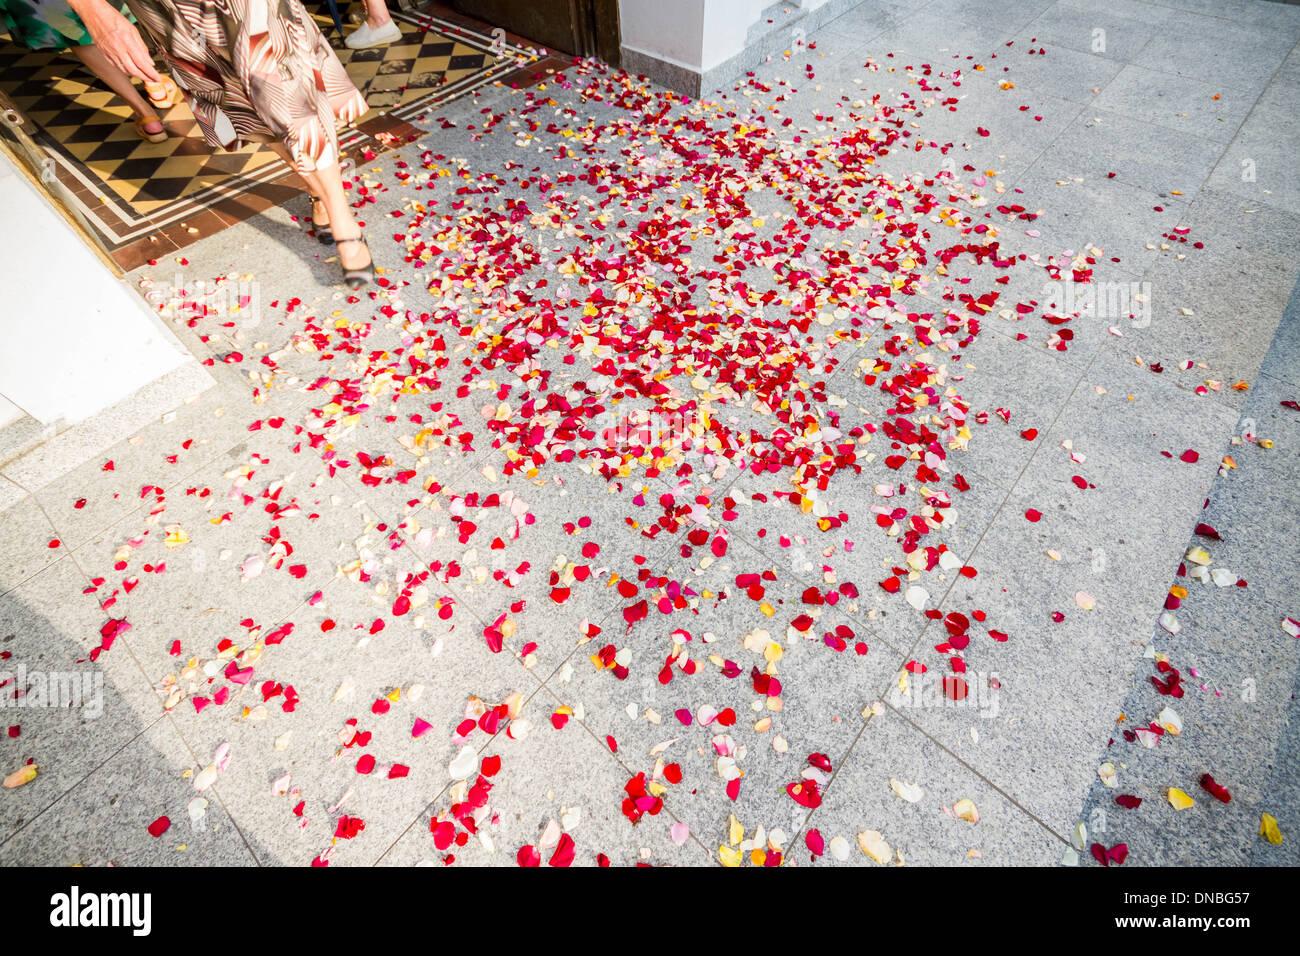 Church Wedding Confetti Imágenes De Stock & Church Wedding Confetti ...